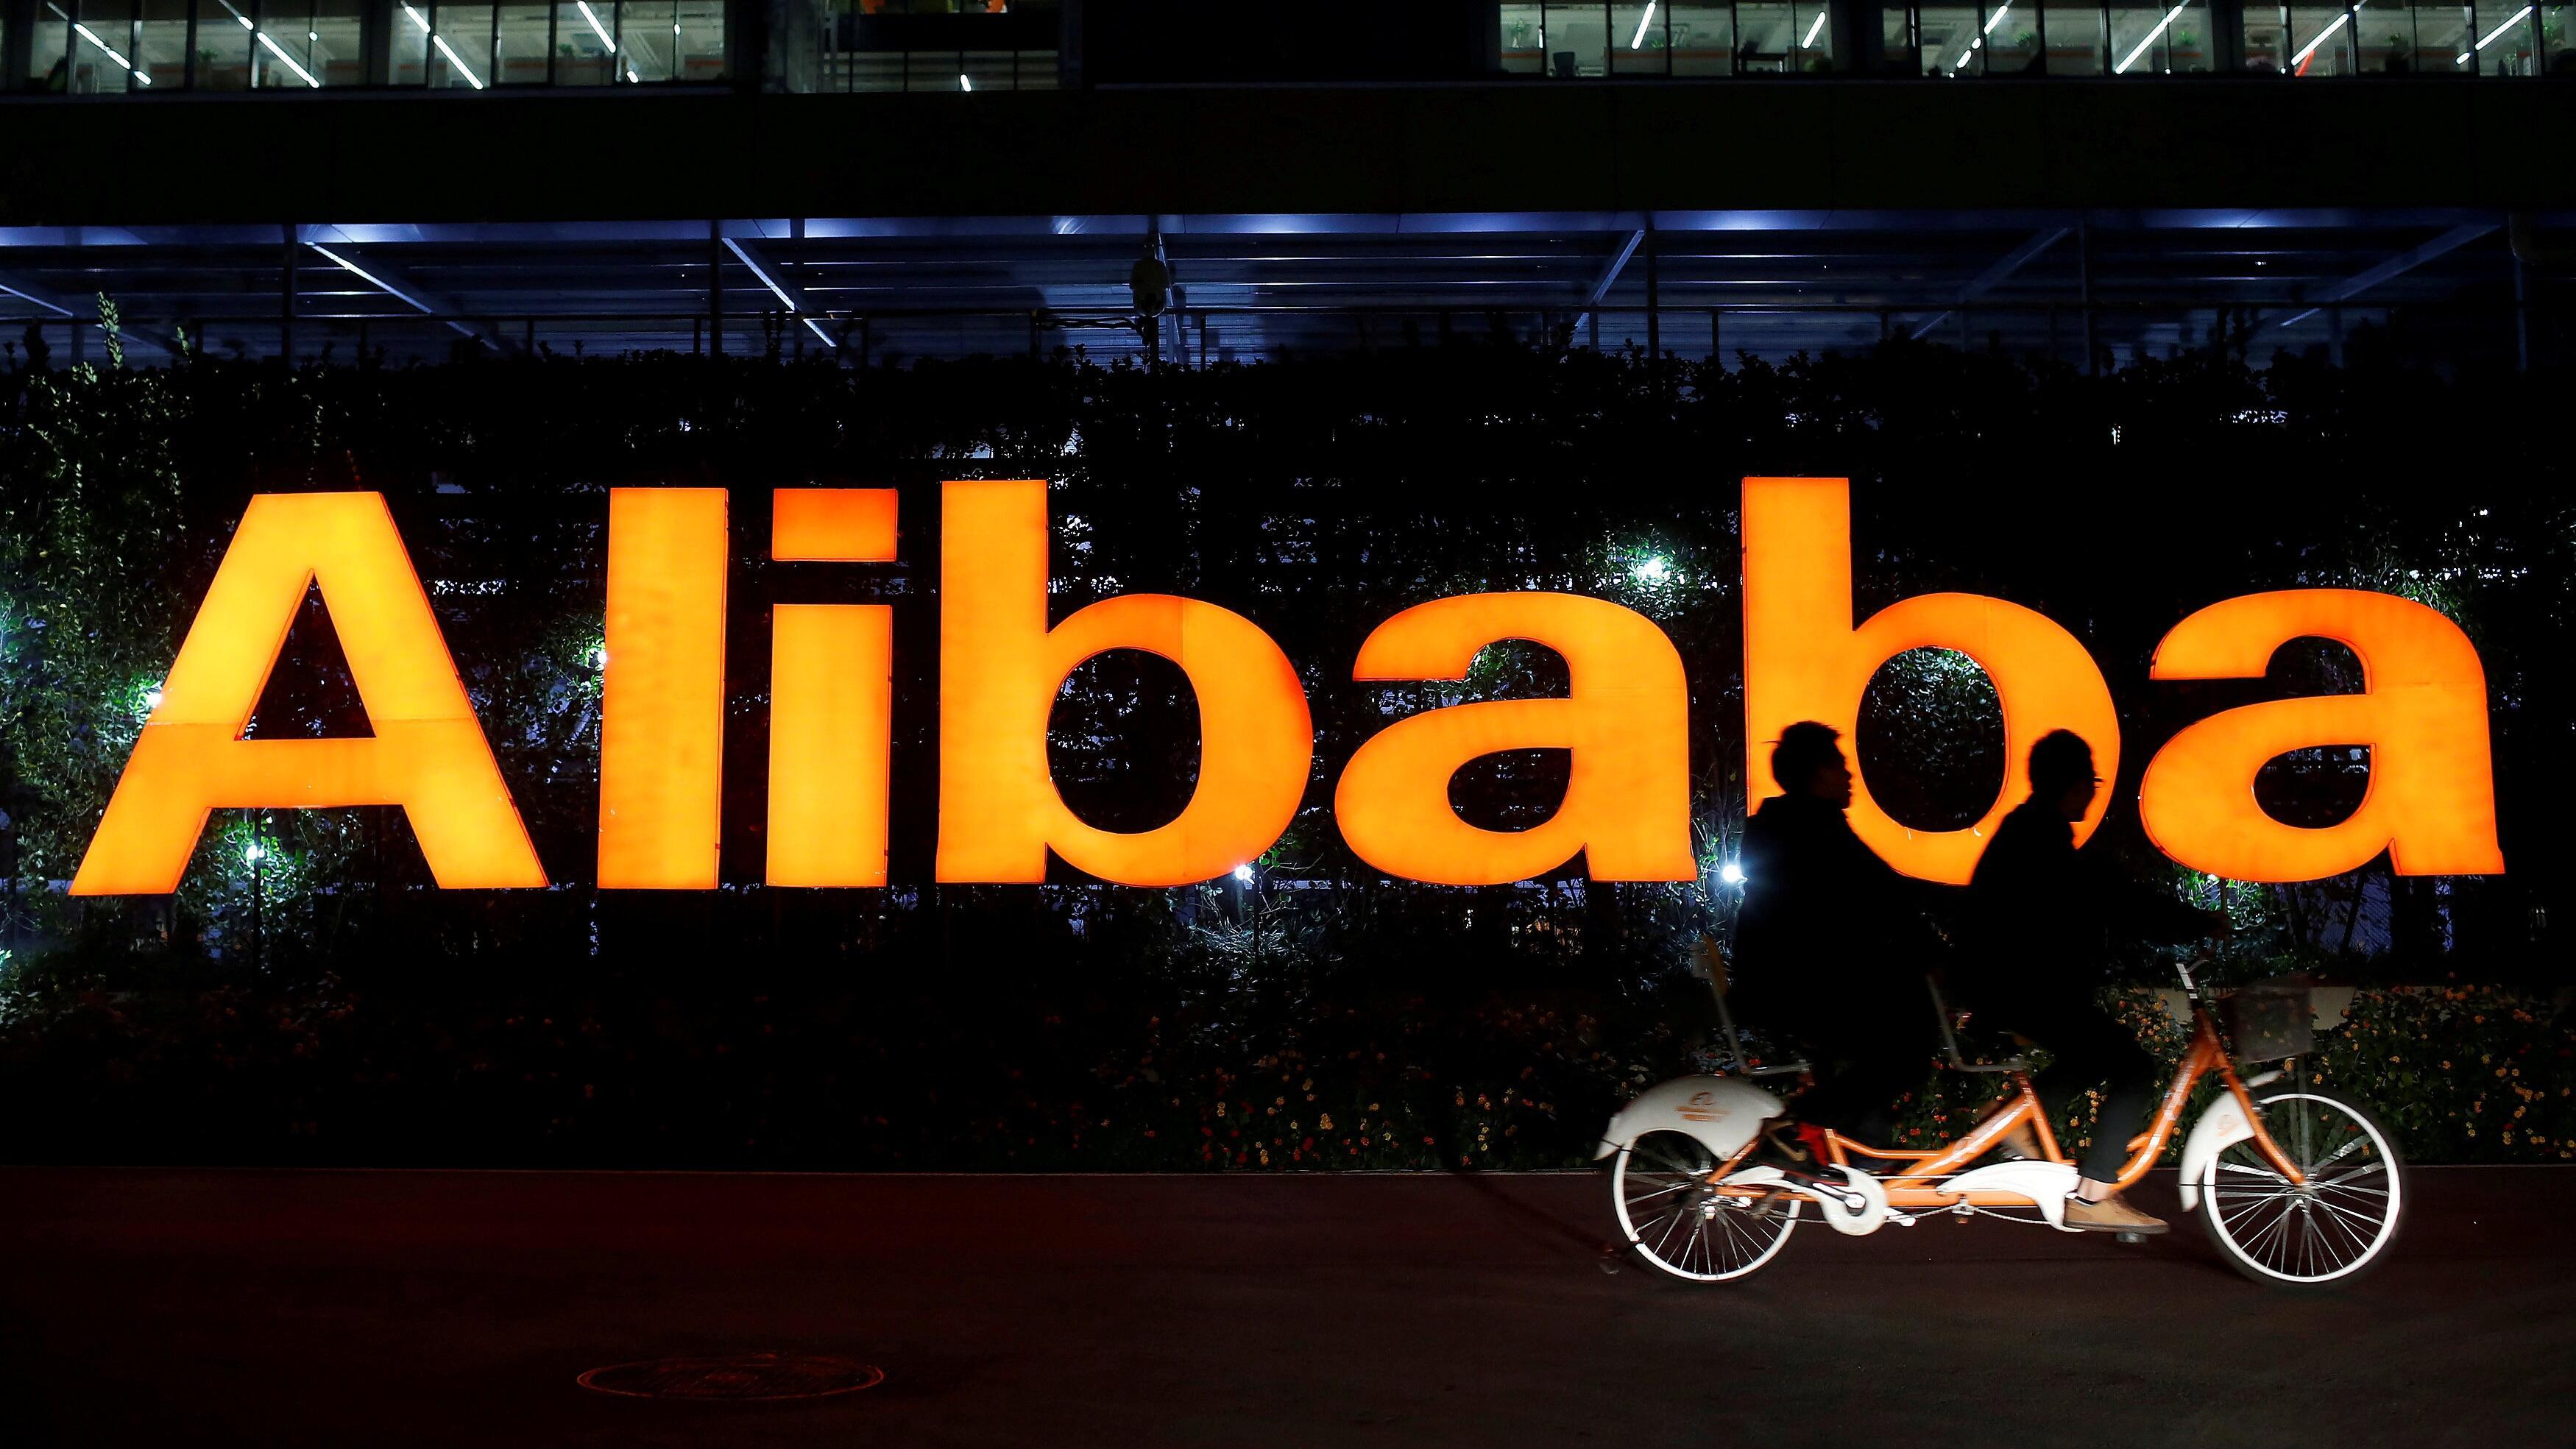 Alibaba Group Raup Pendapatan Rp 135 Triliun di Januari-Maret 2018